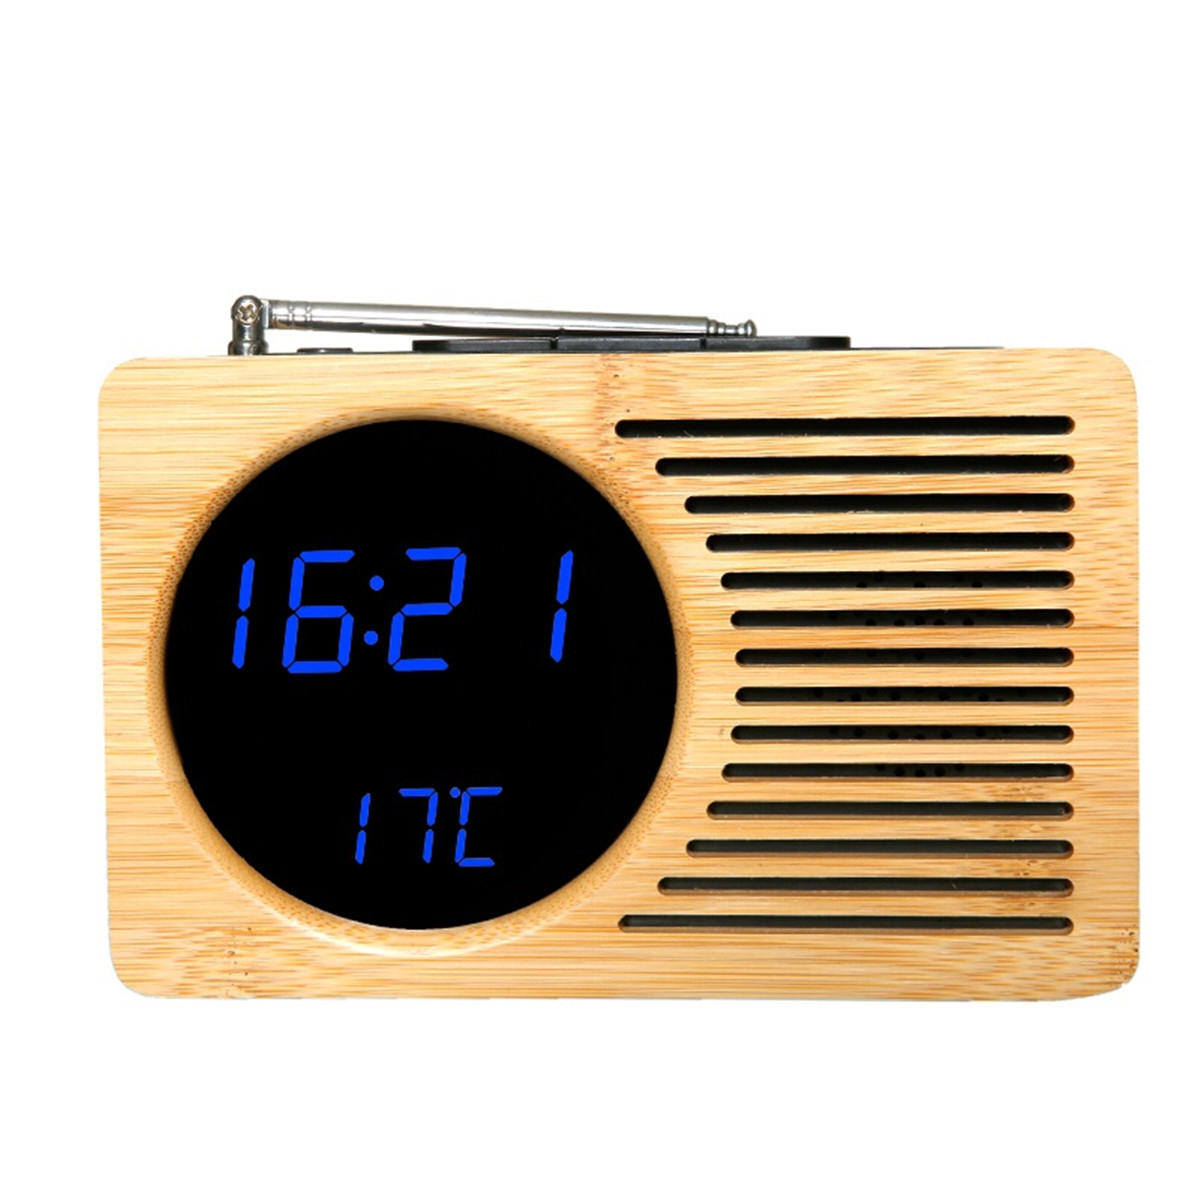 Retro Bamboo Led Digital Fm Radio Alarm Clock Sound Control Time Date Temperature For Bedroom Office Home